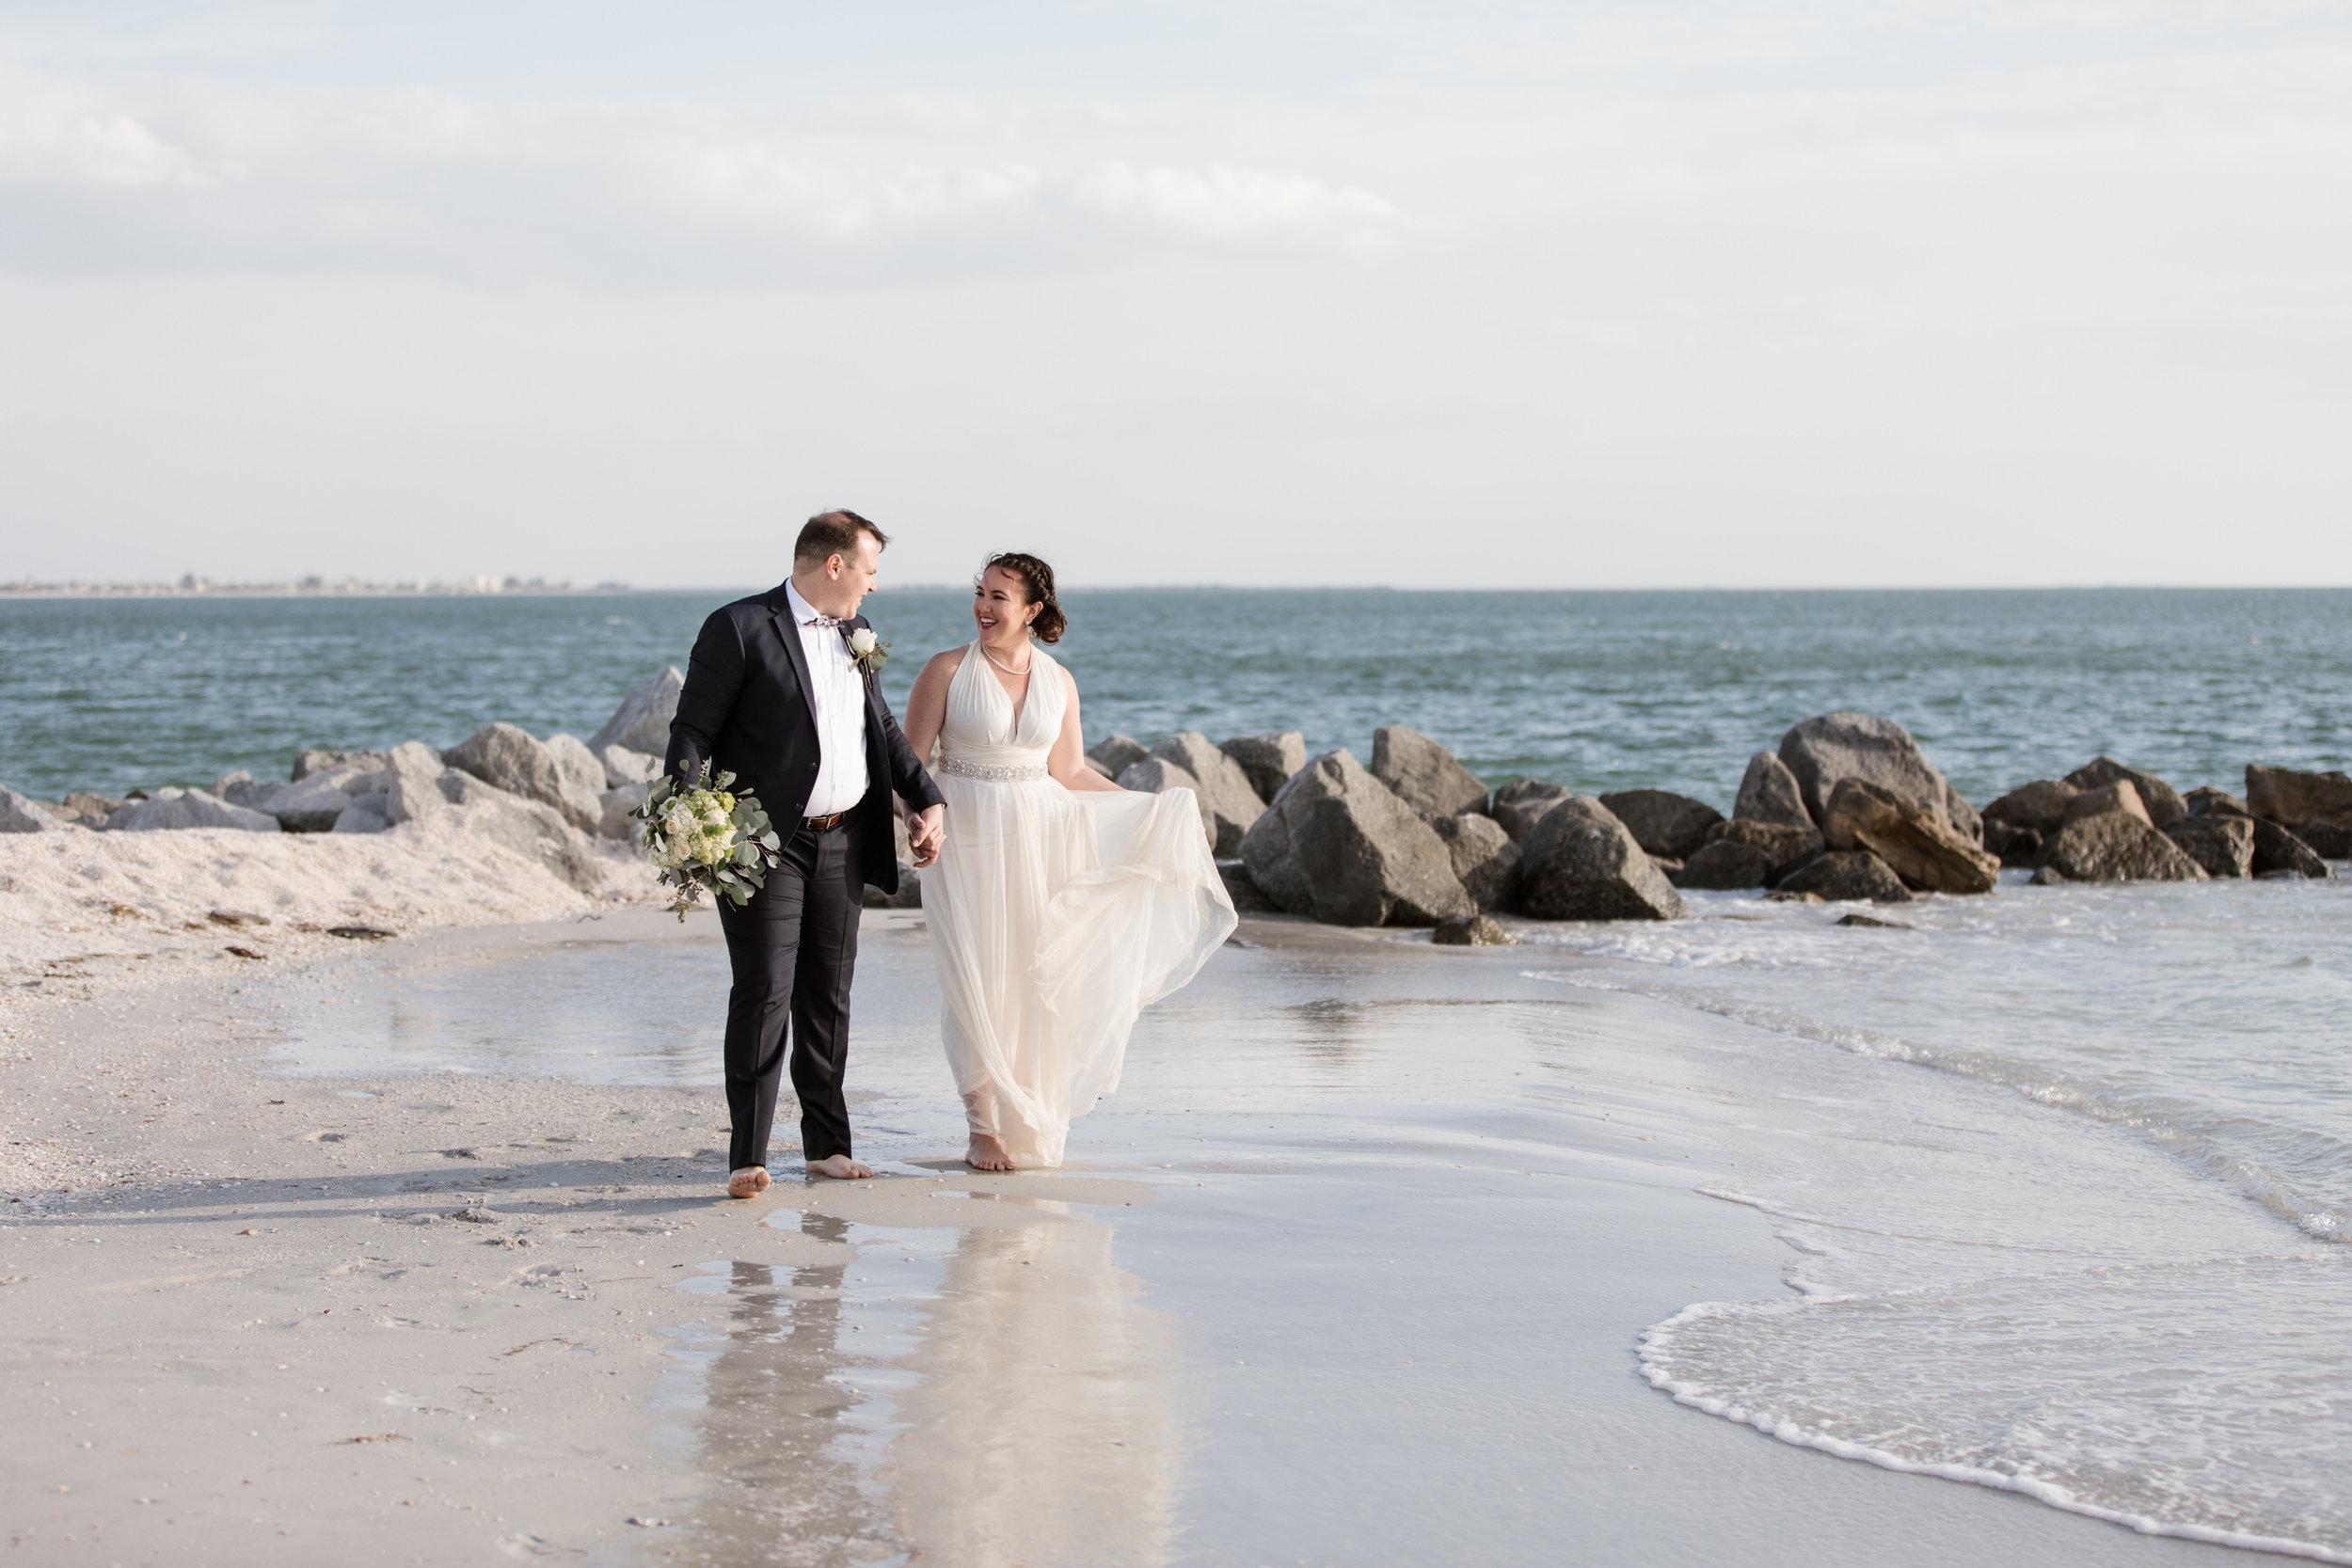 Beltran_Treasure_Island_Elopement_Tampa_Wedding_064-1.jpg